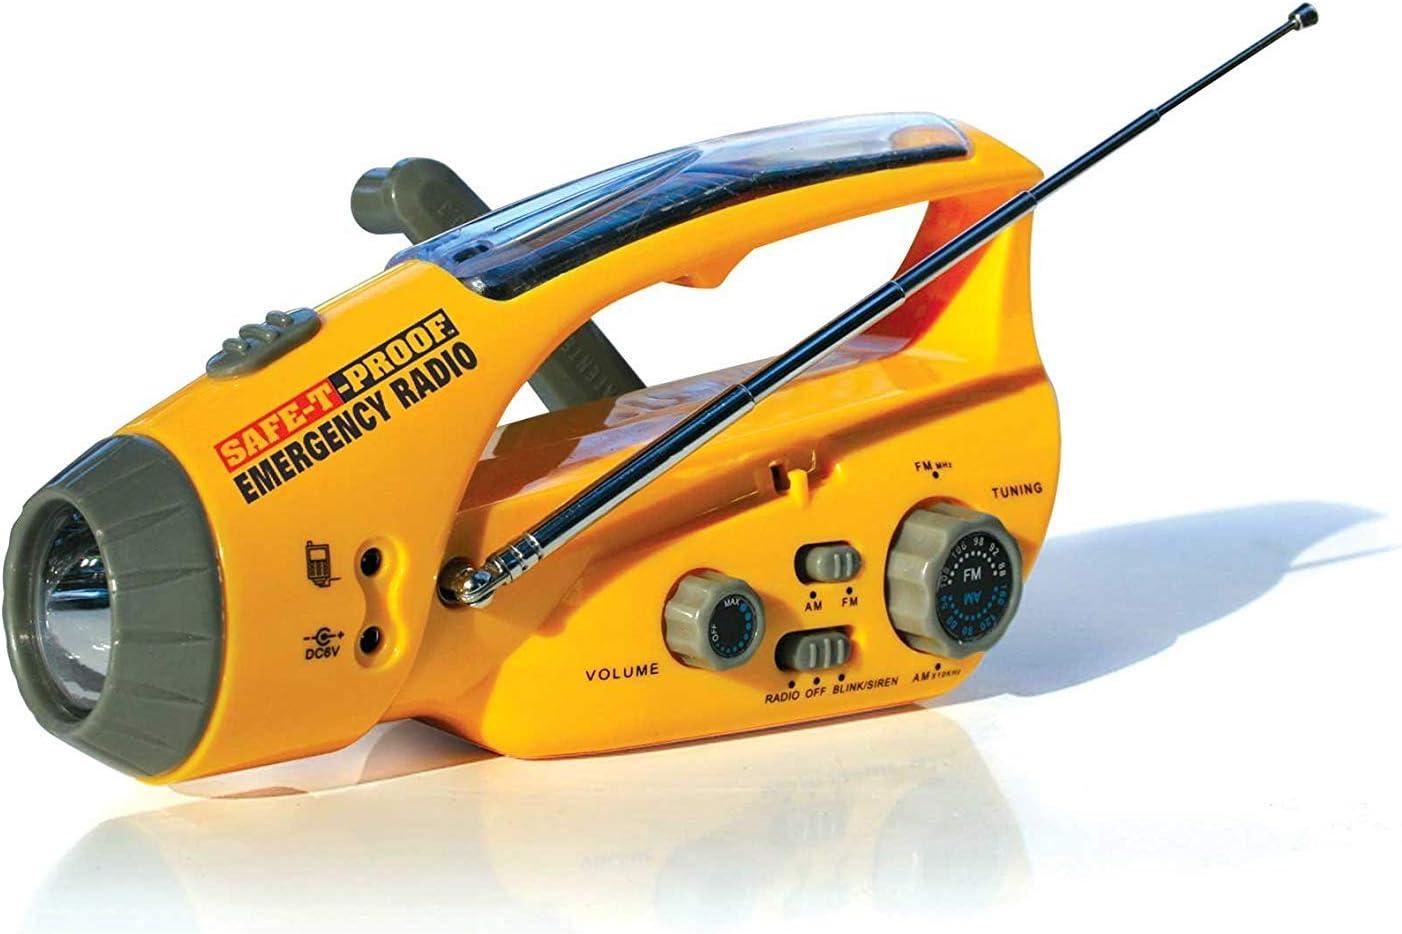 Cell Phone Charger Beacon Flashlight Hand-Crank Emergency Radio Safe-T-Proof Solar